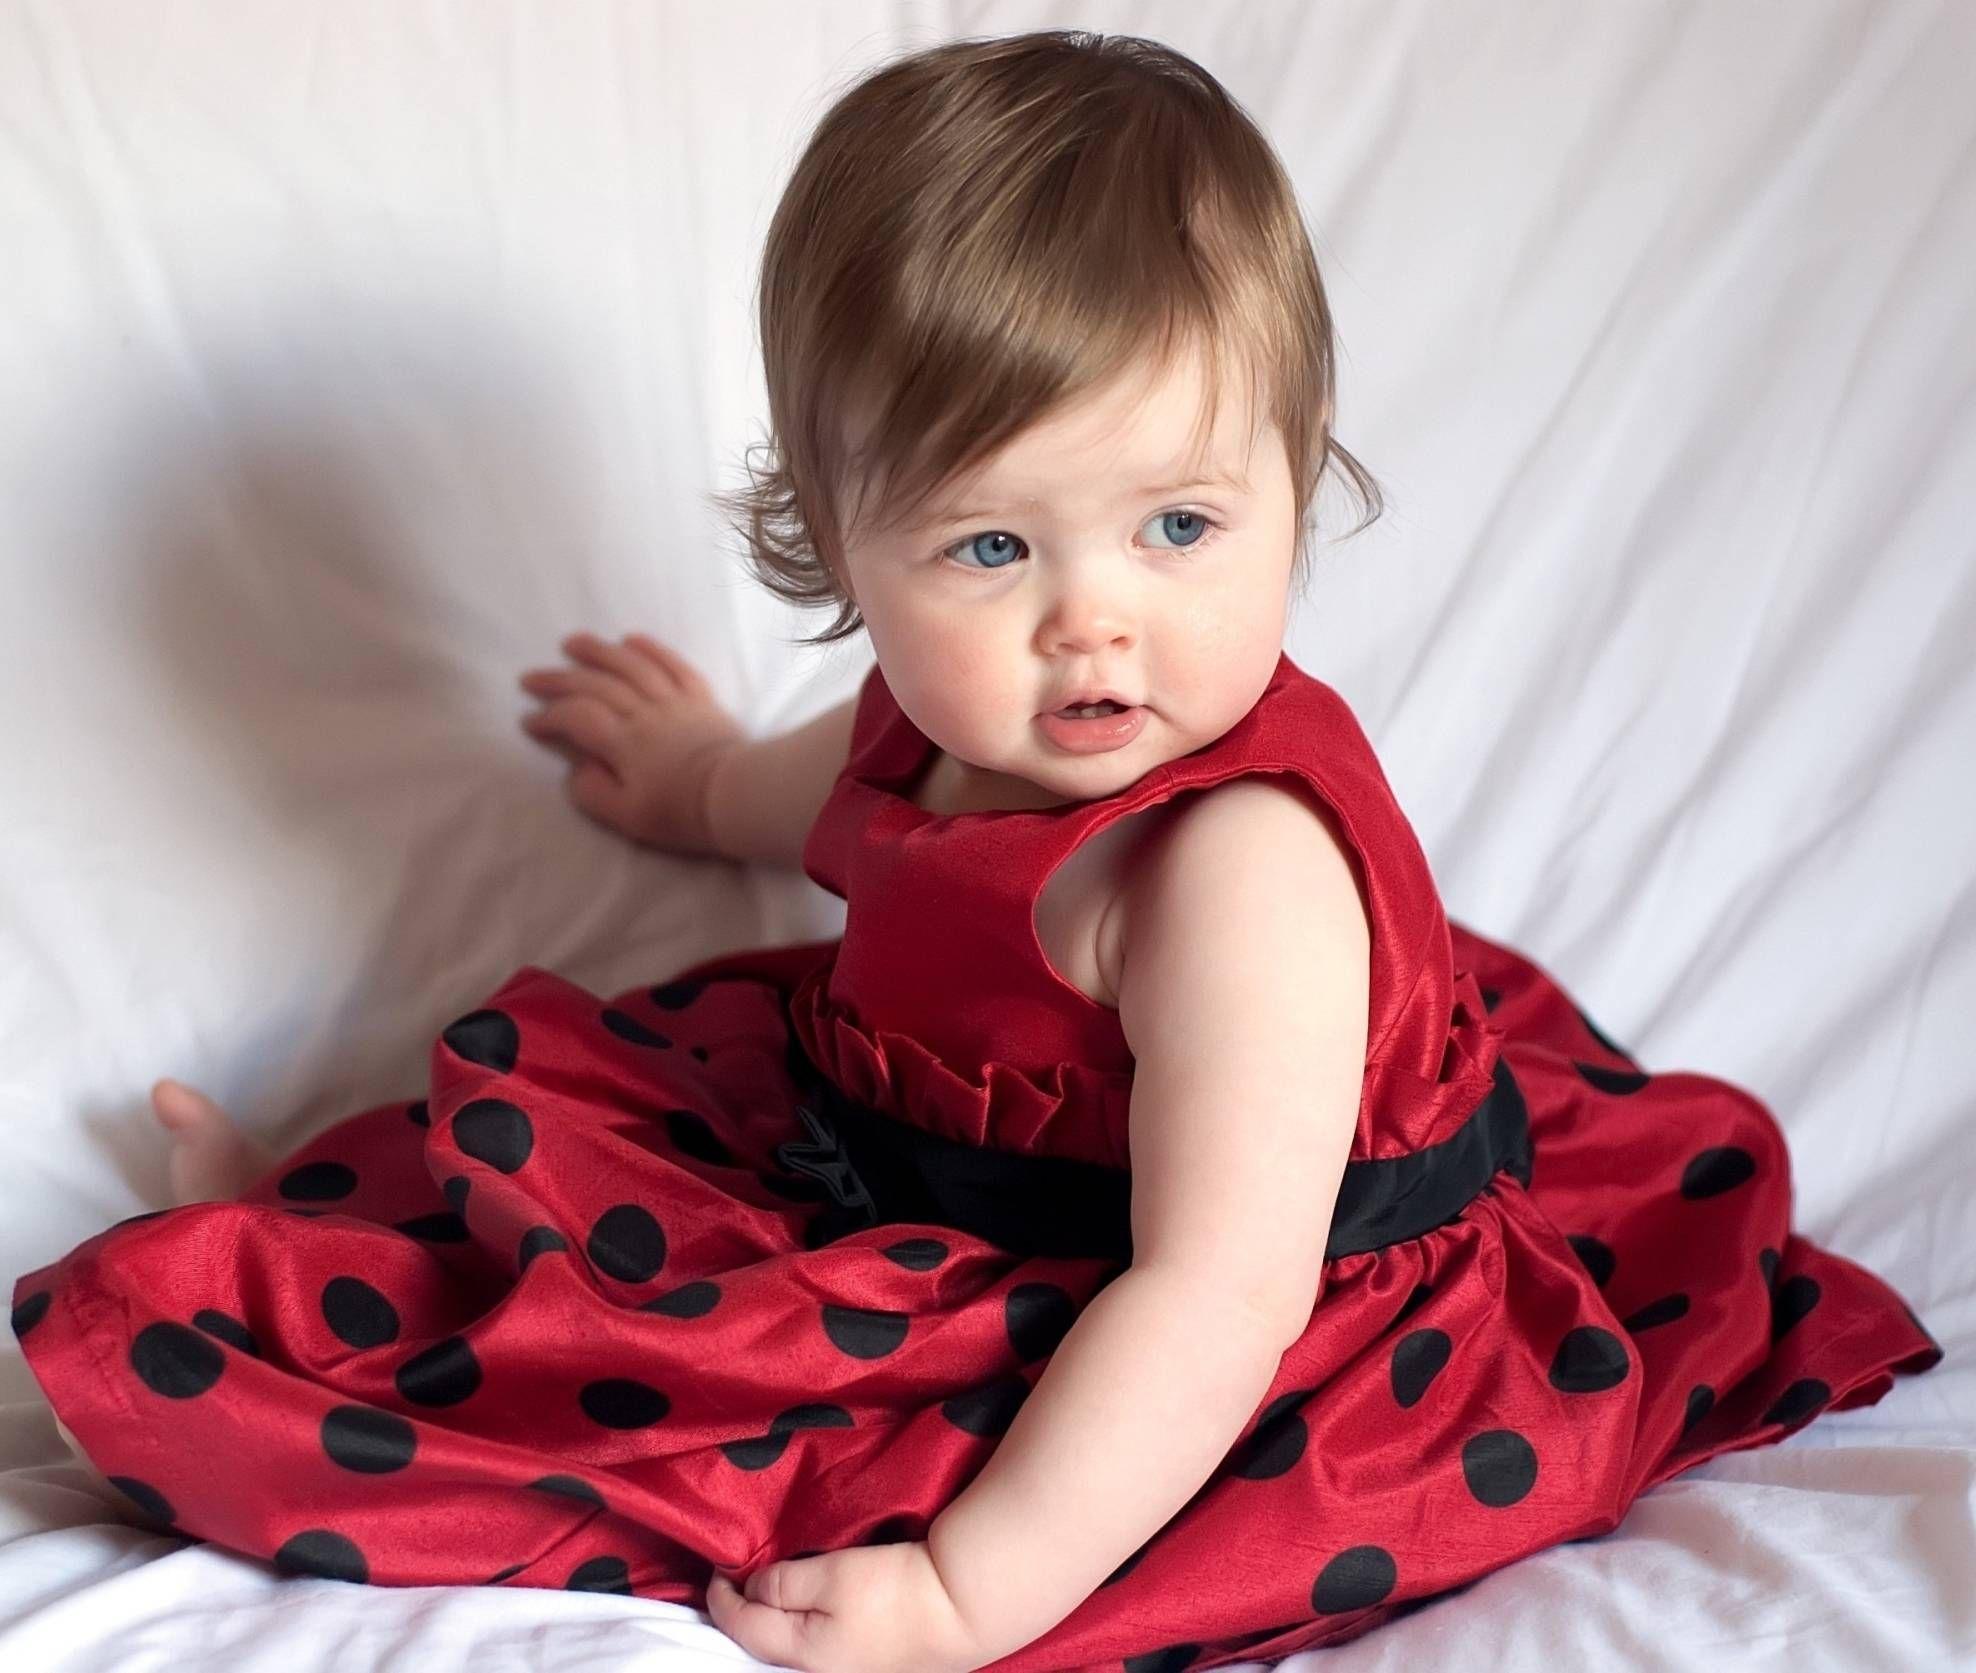 pinanais anais on baby | pinterest | cute babies, baby and cute